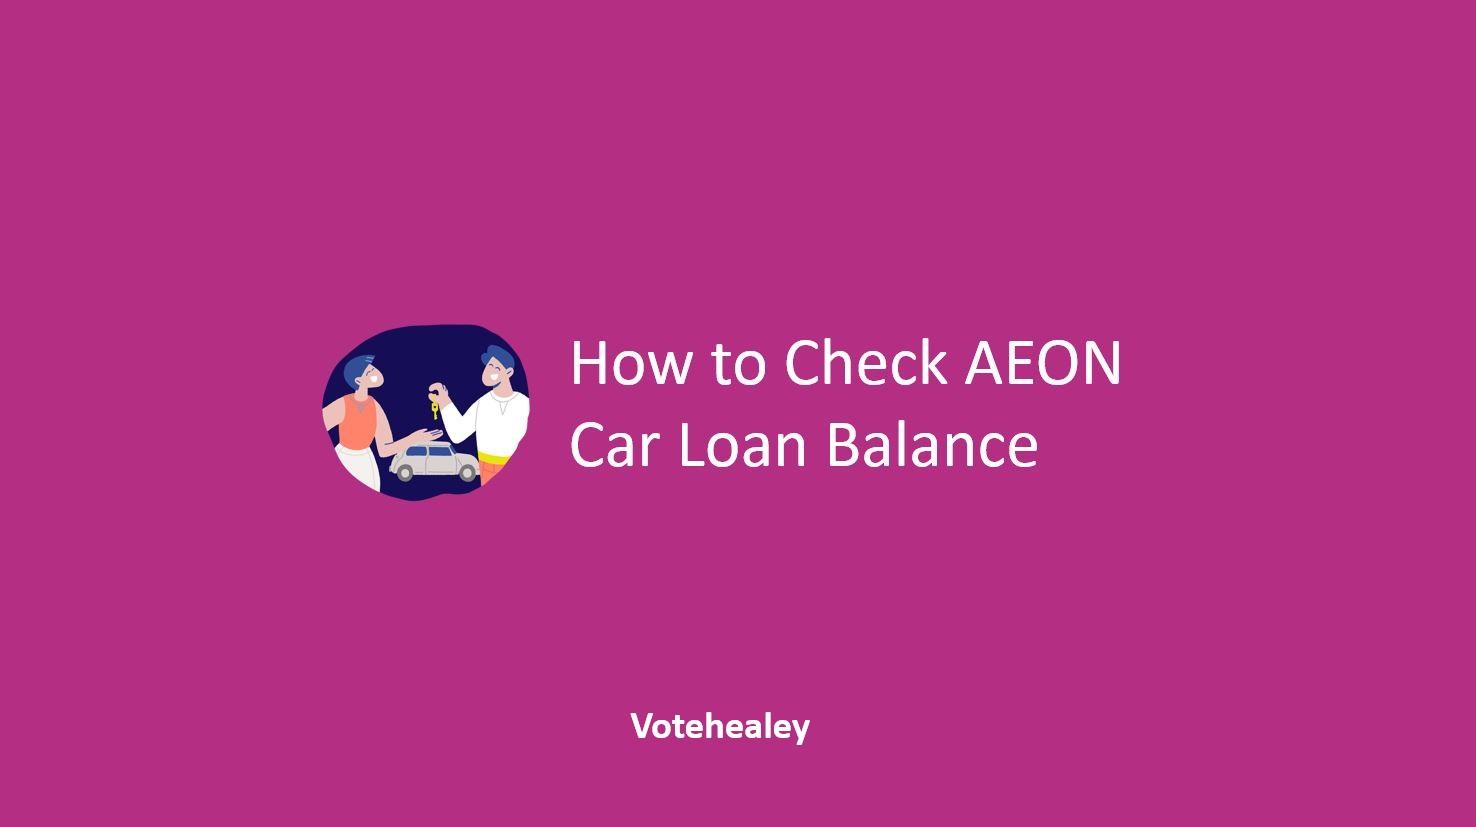 How to Check AEON Car Loan Balance